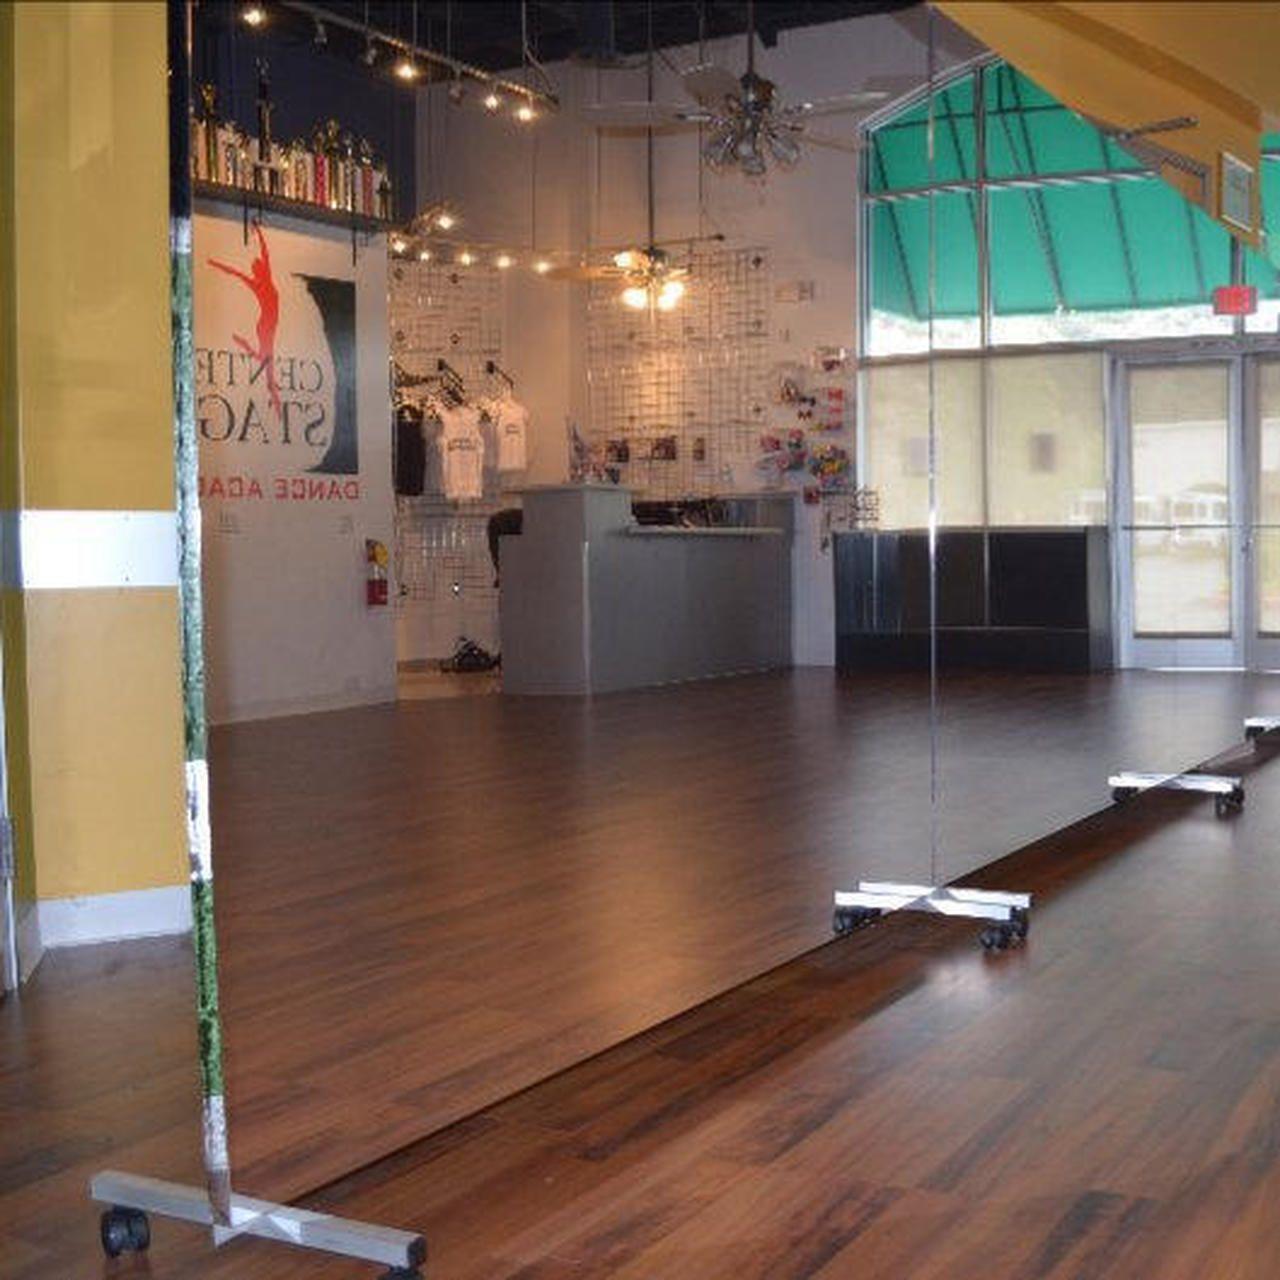 Glassless Rolling Dance Mirrors In 2020 Dance Rooms Dance Mirrors Dance Studio Design